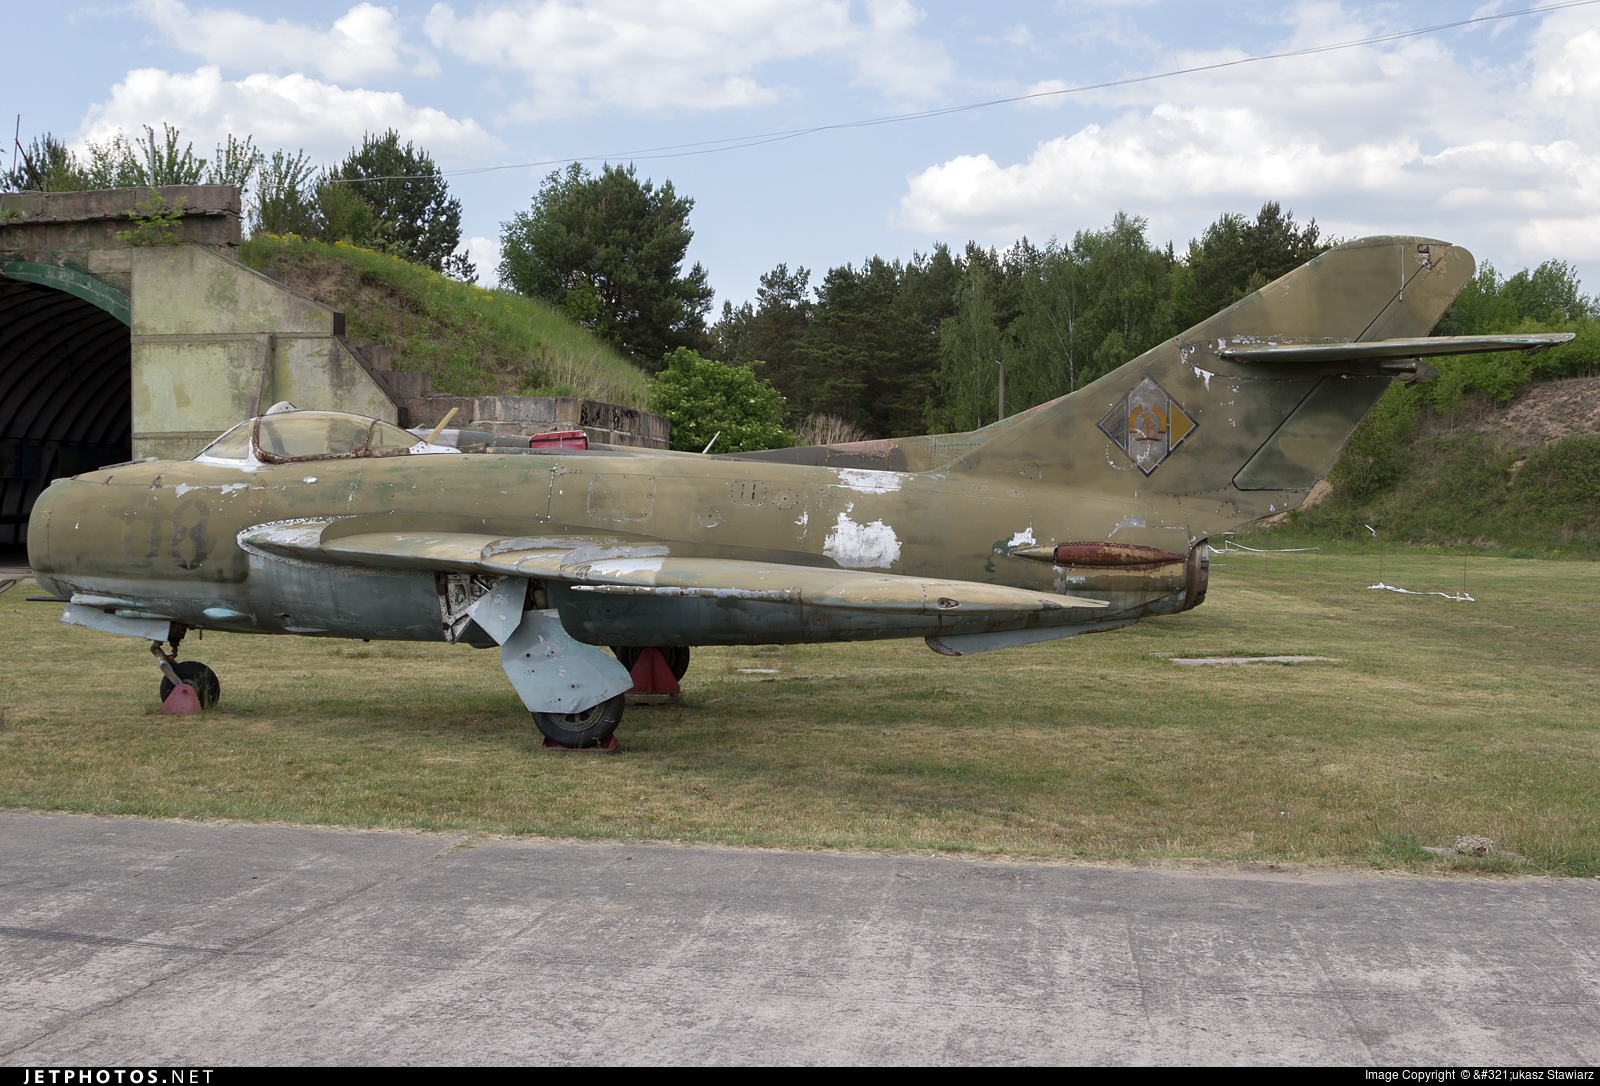 08 - Mikoyan-Gurevich MiG-17 Fresco - German Democratic Republic - Air Force